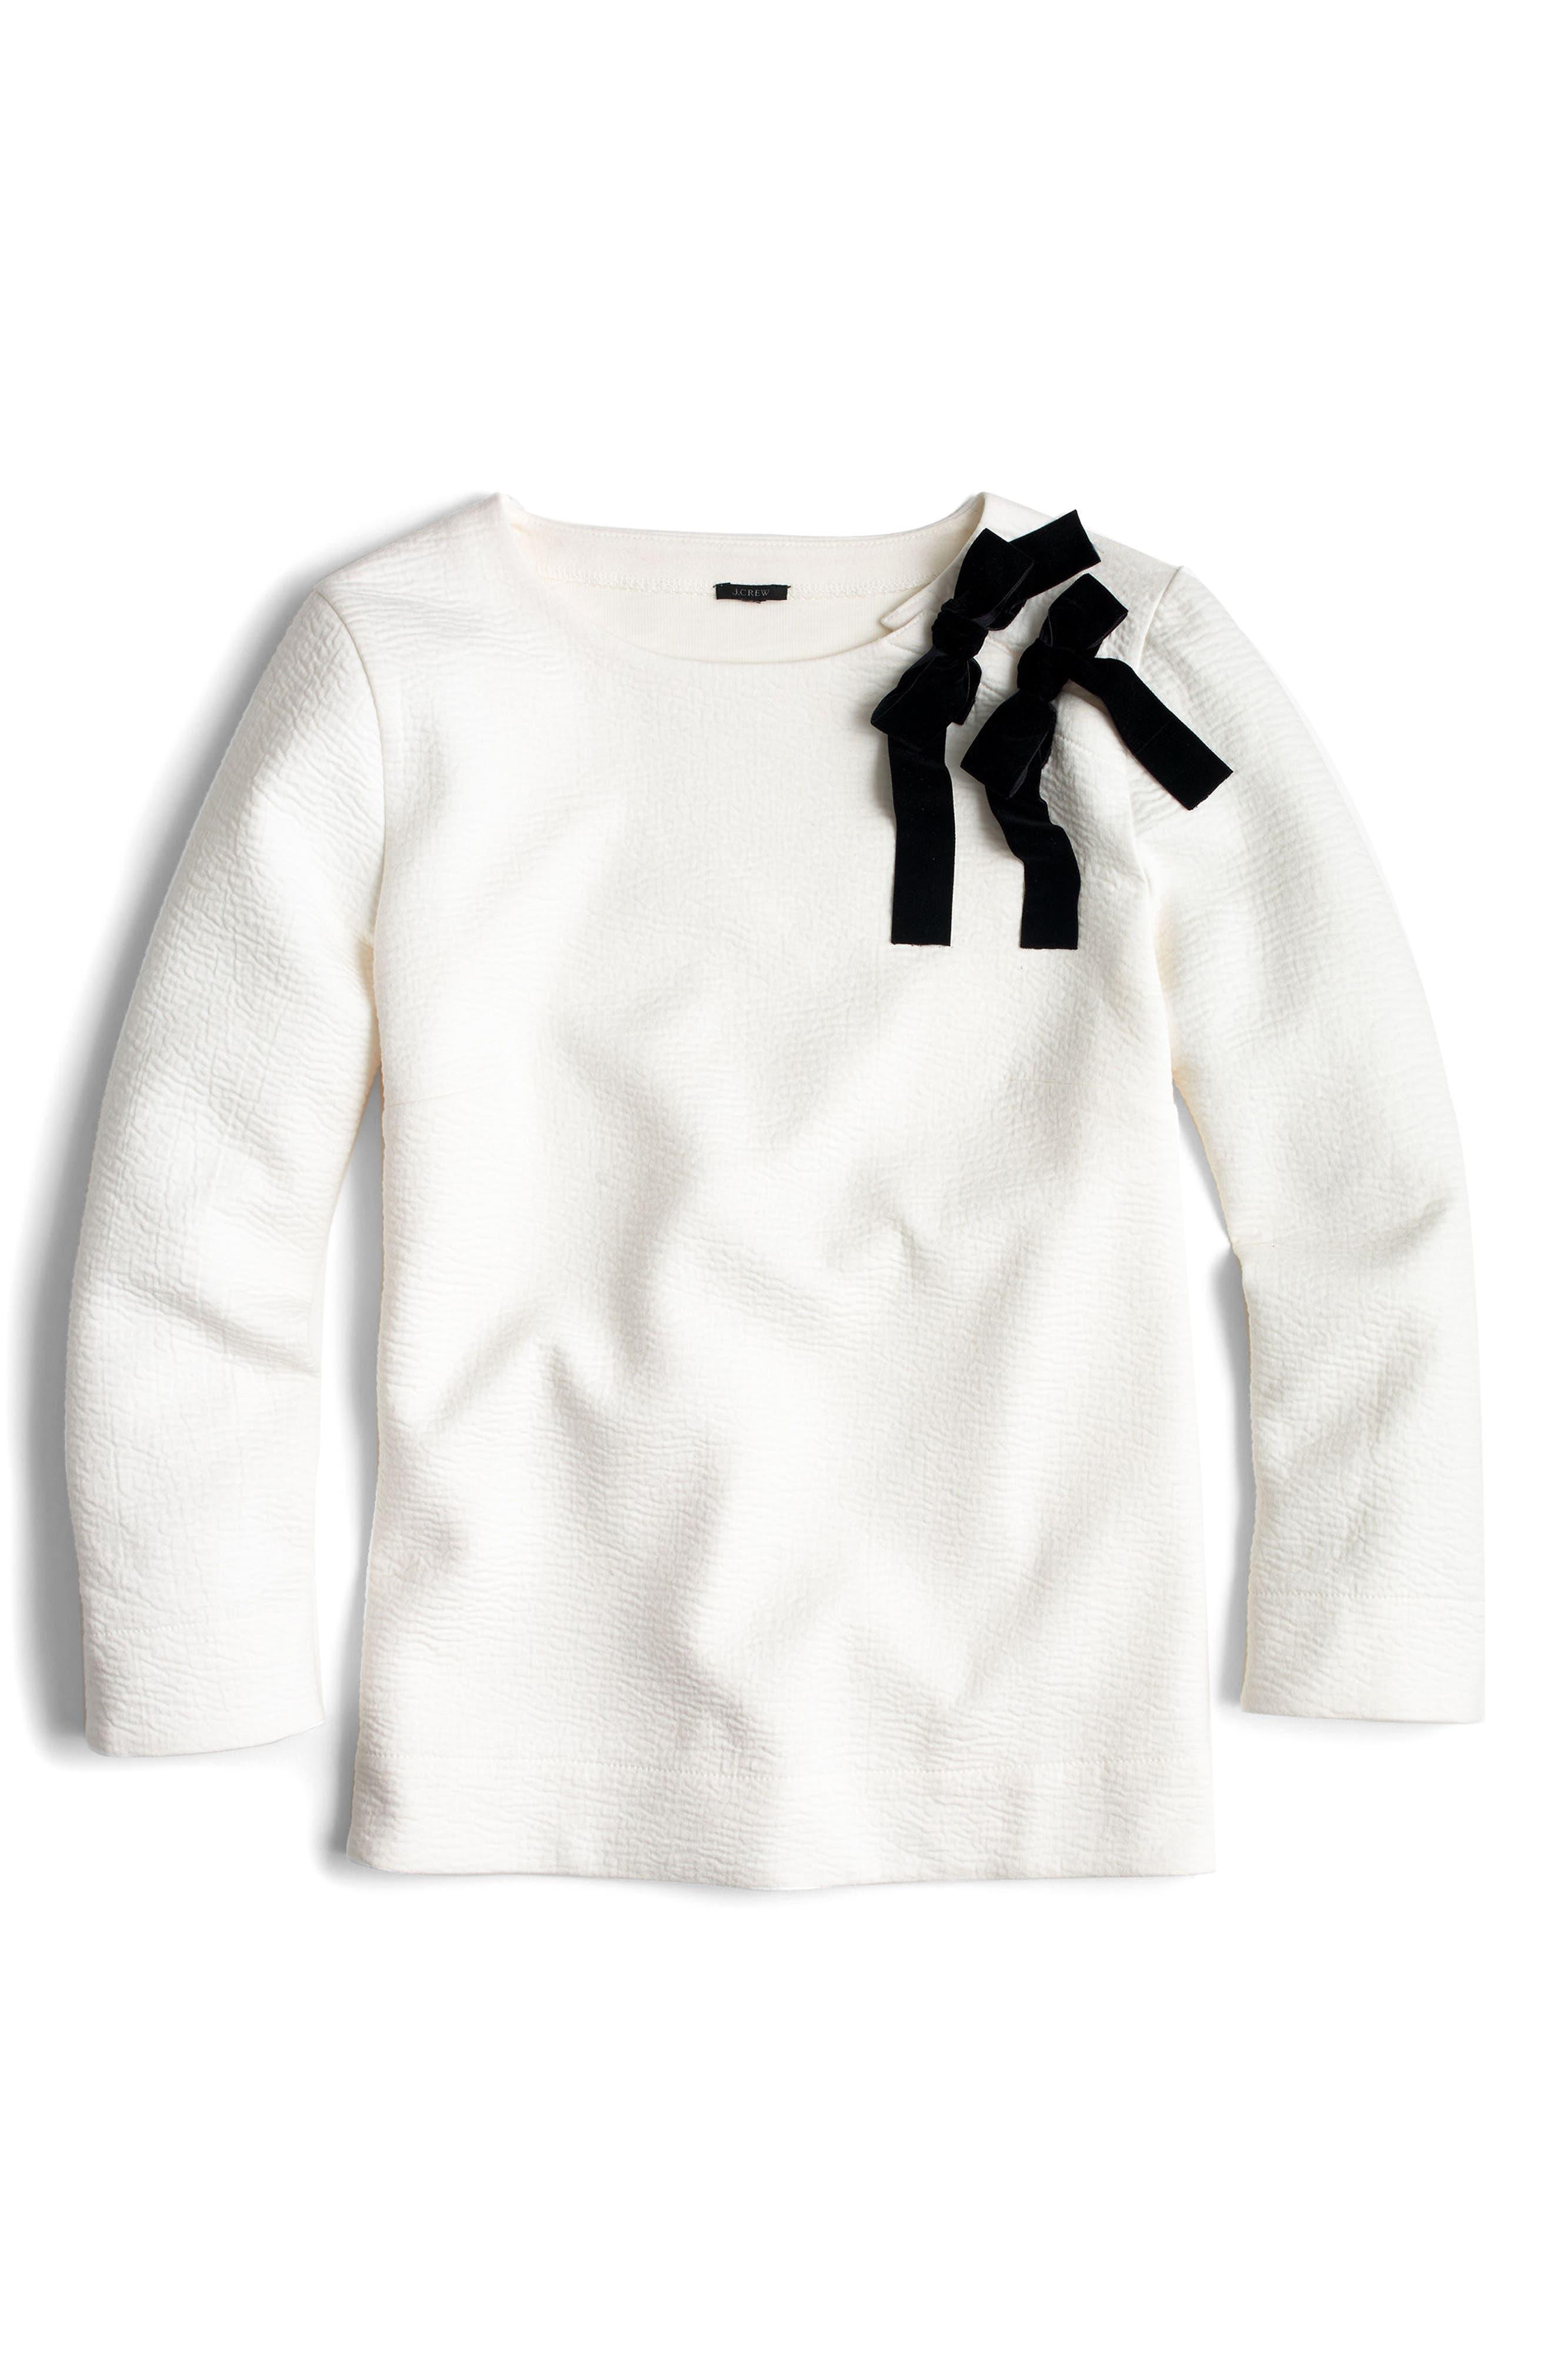 Alternate Image 1 Selected - J.Crew Double Bow Sweatshirt